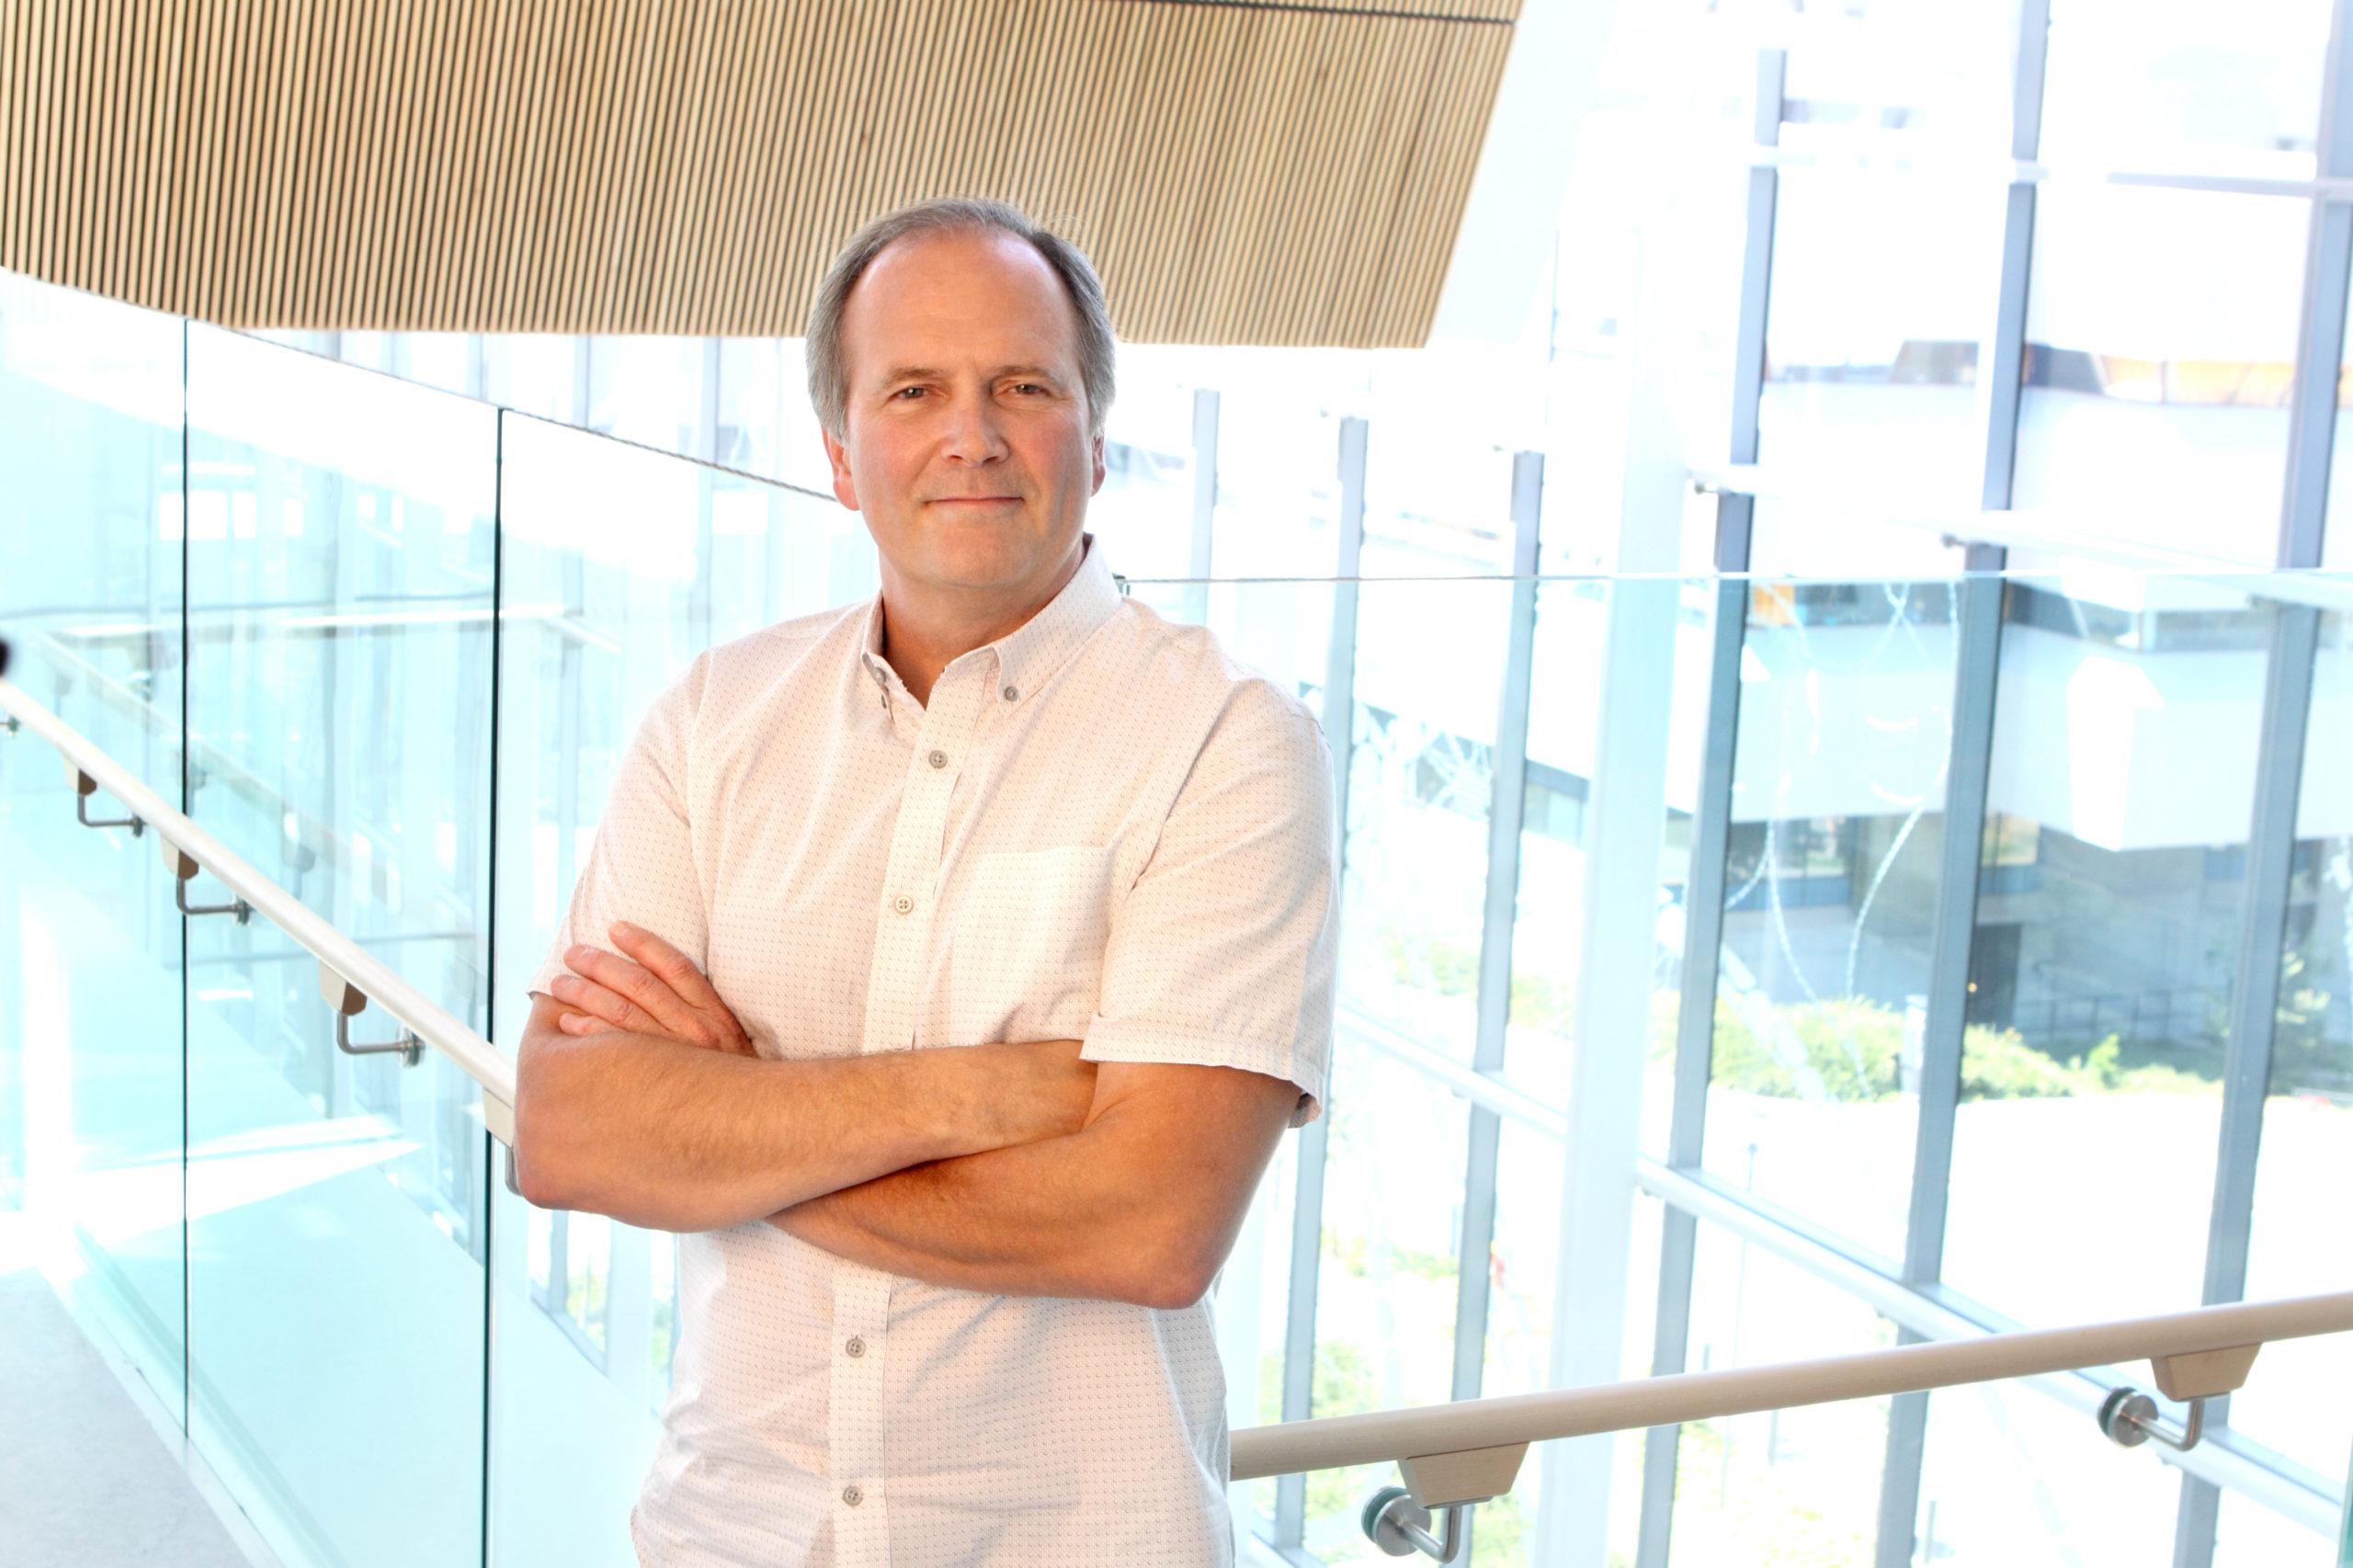 Dr. Tim O'Connor